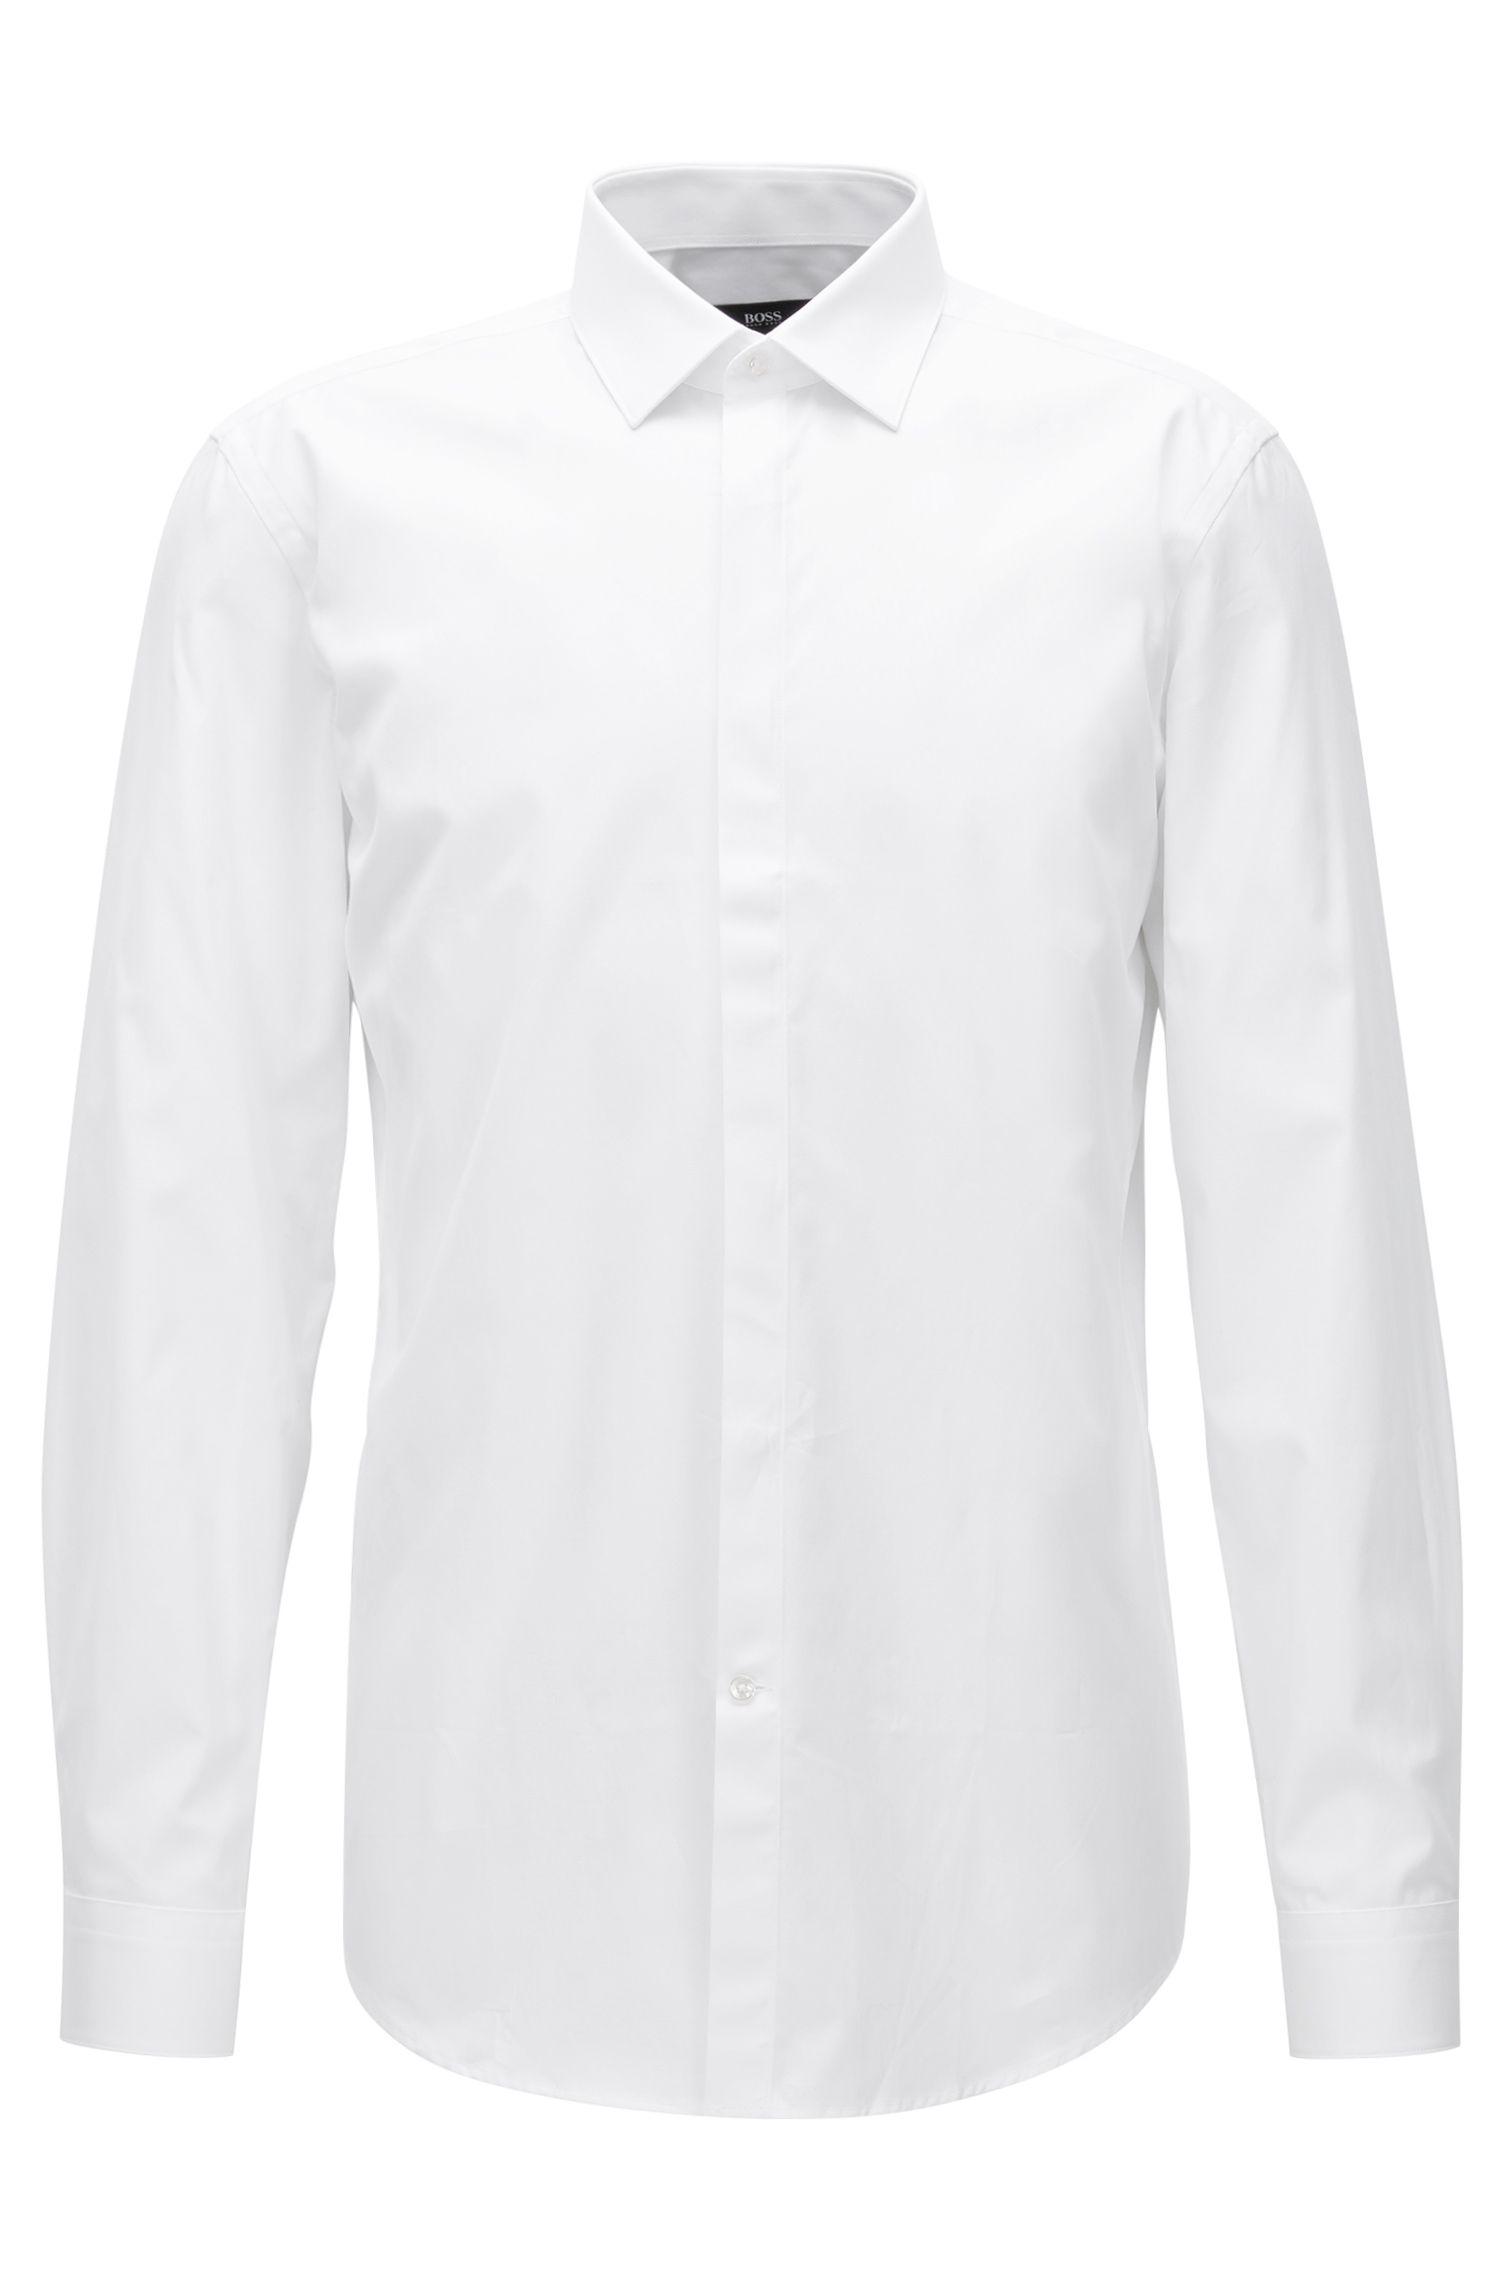 Cotton Dress Shirt, Slim Fit | Jeff